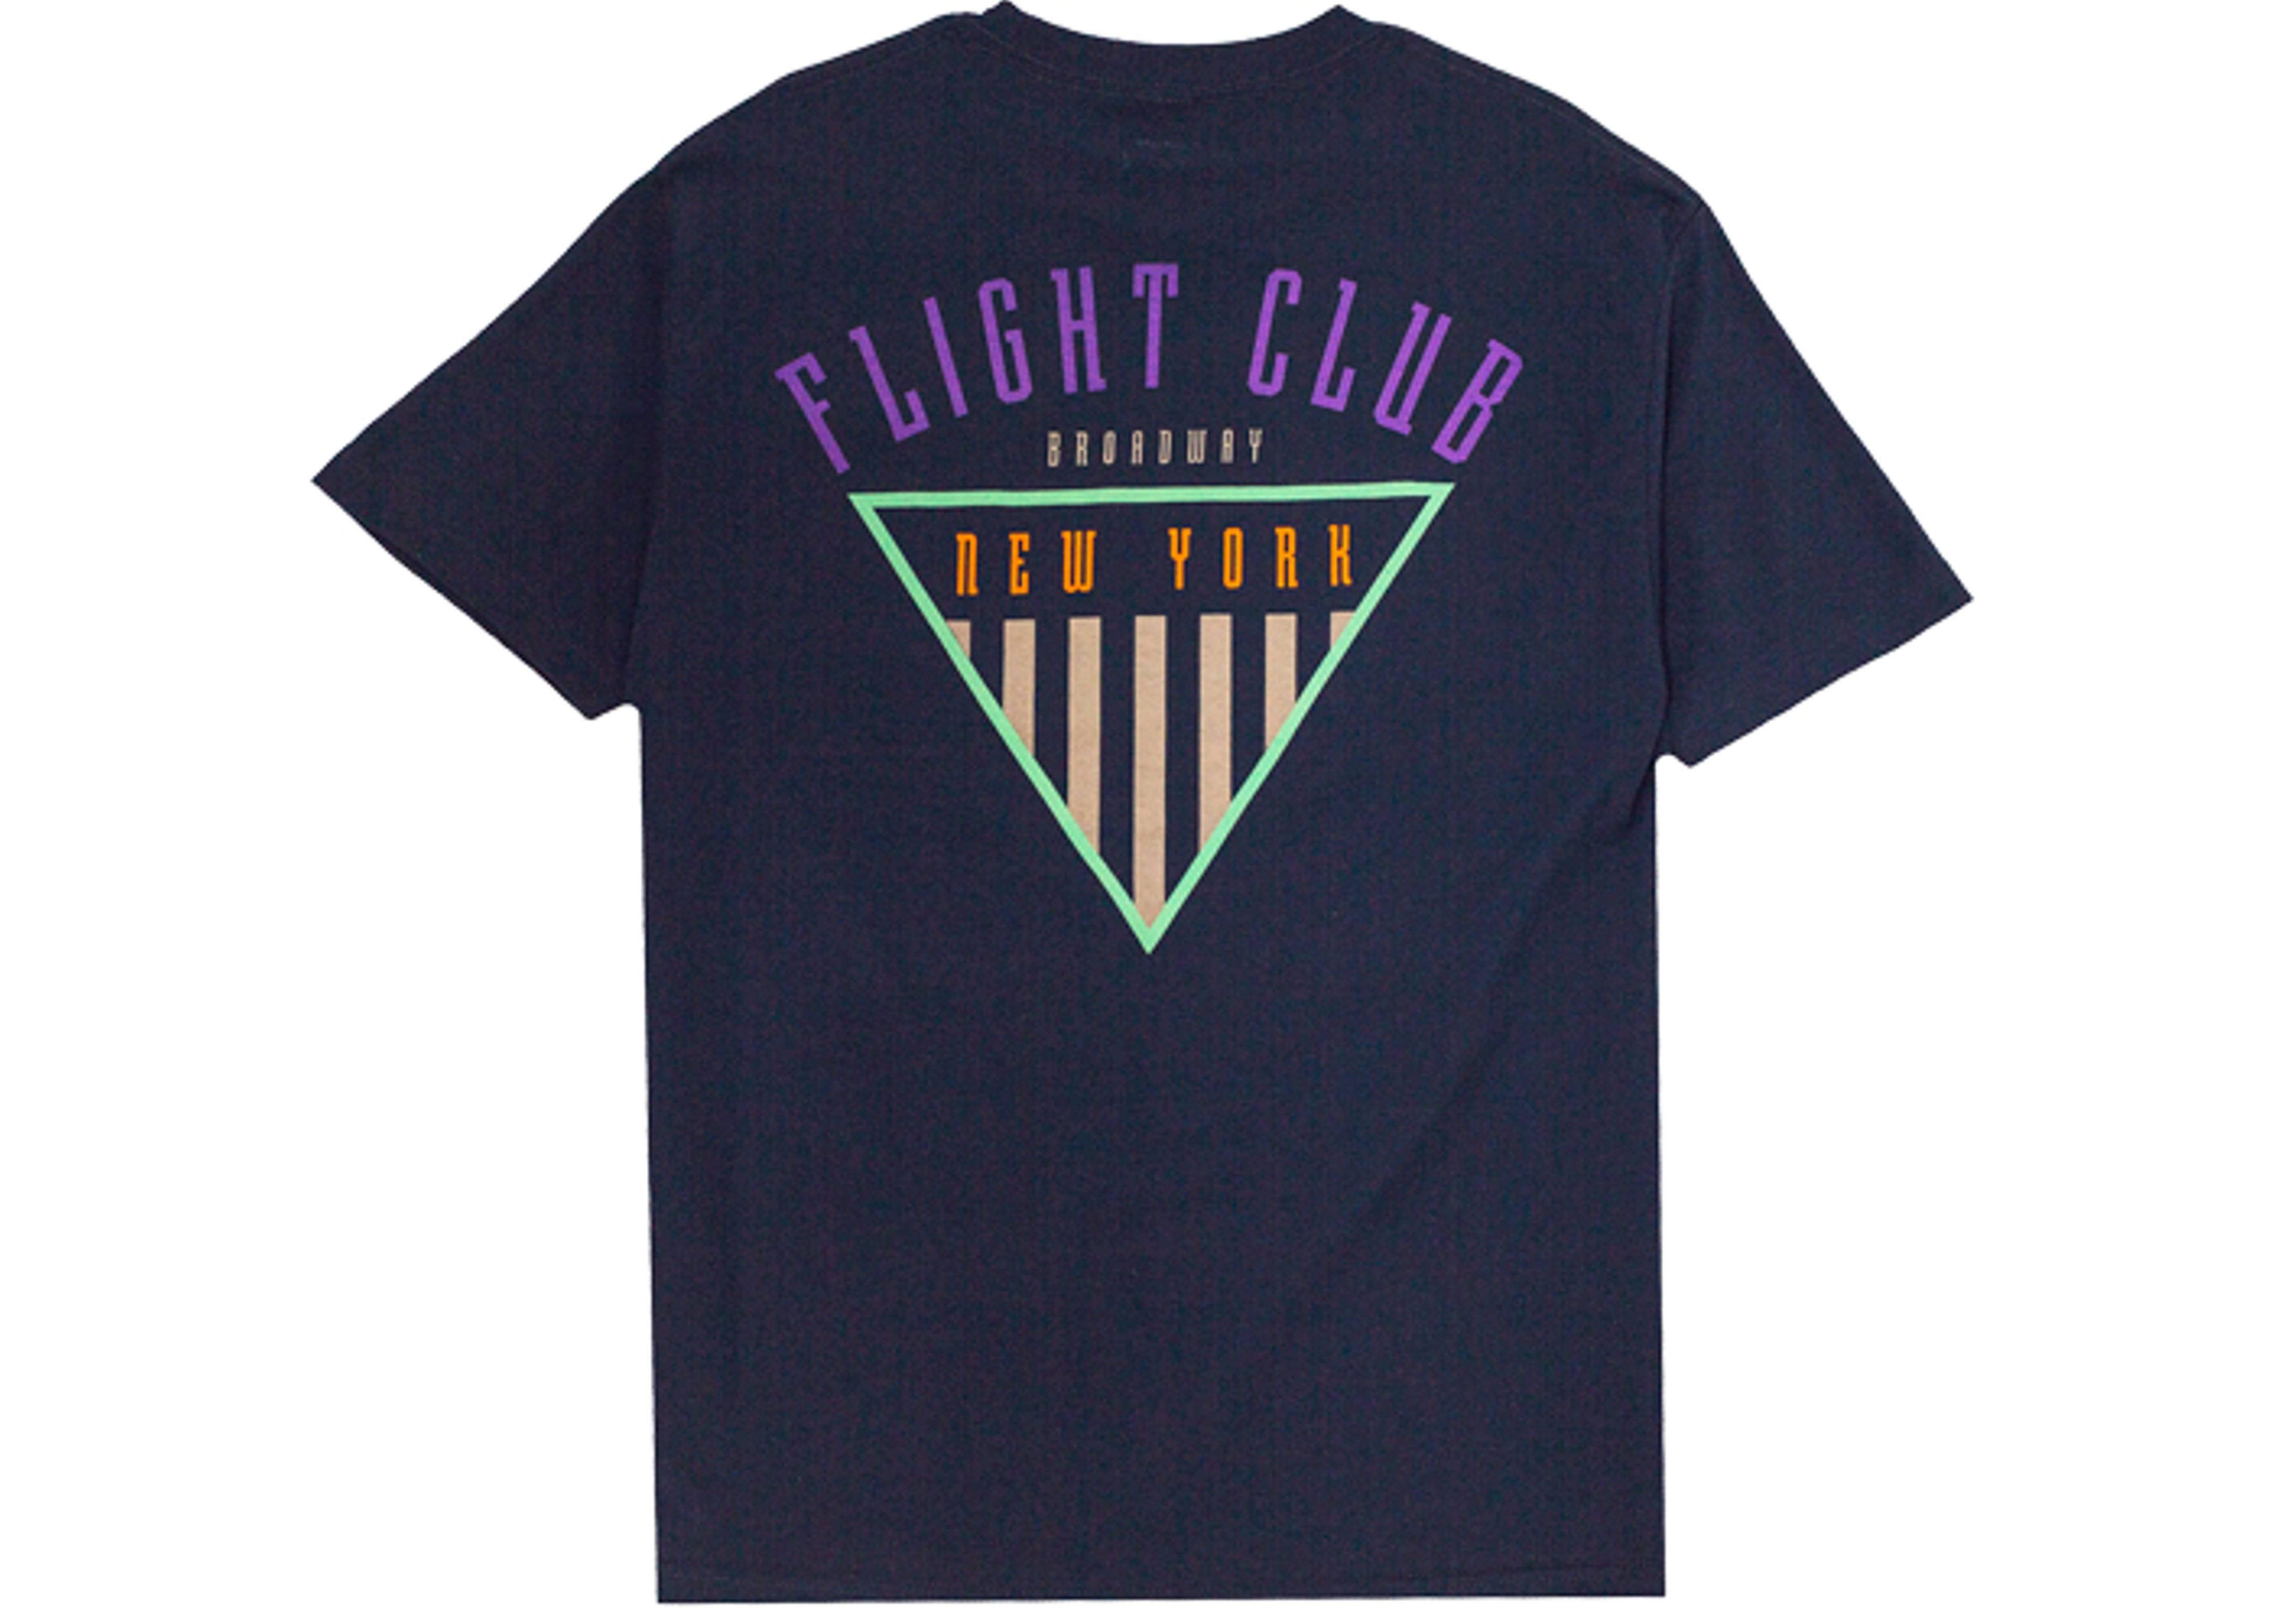 tri pocket t-shirt